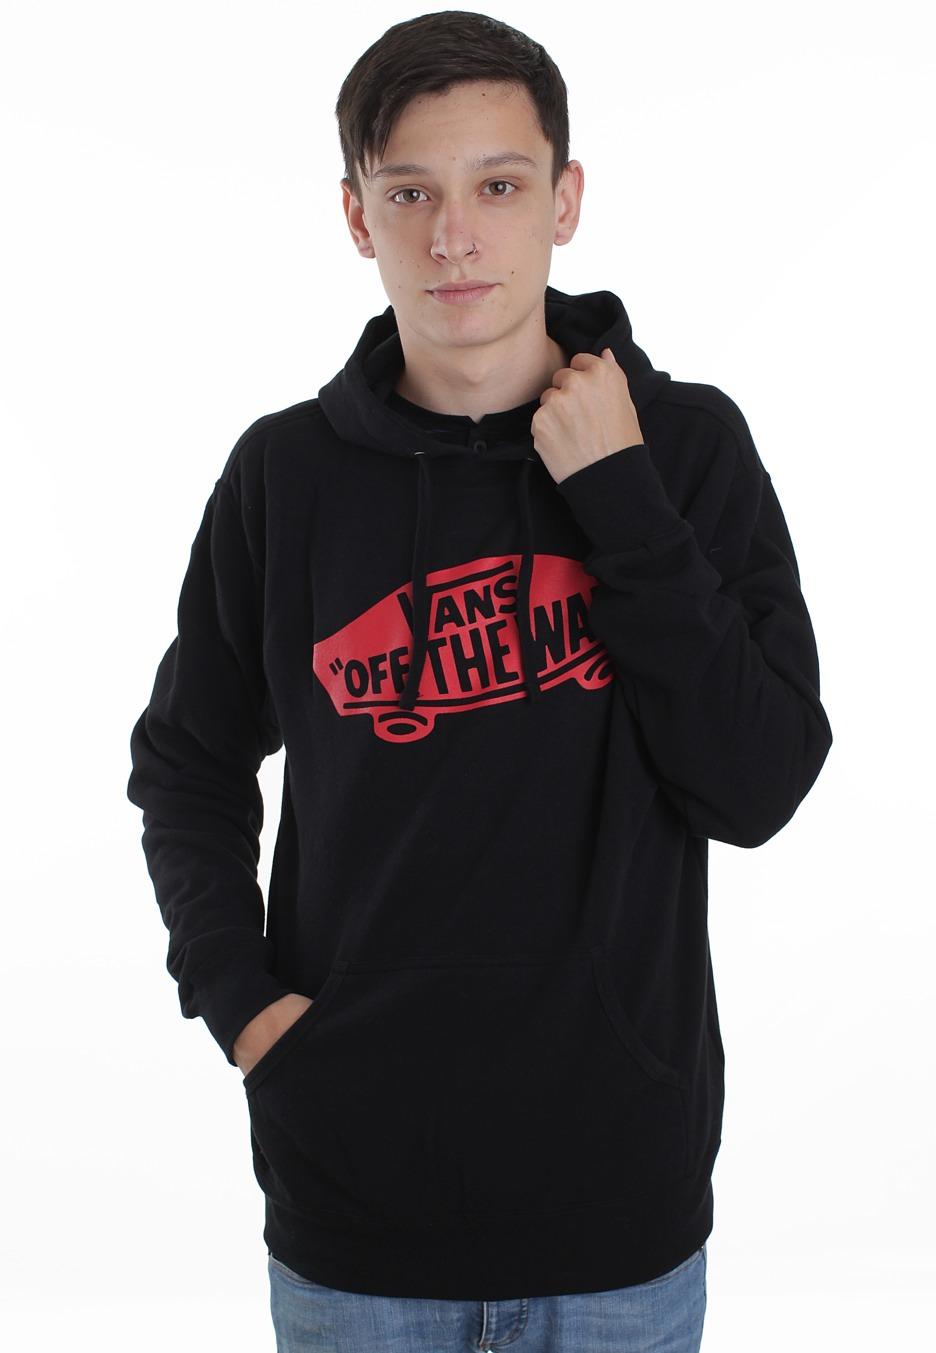 d7de1cf7ce Vans - OTW Pullover Black Red - Hoodie - Impericon.com Worldwide